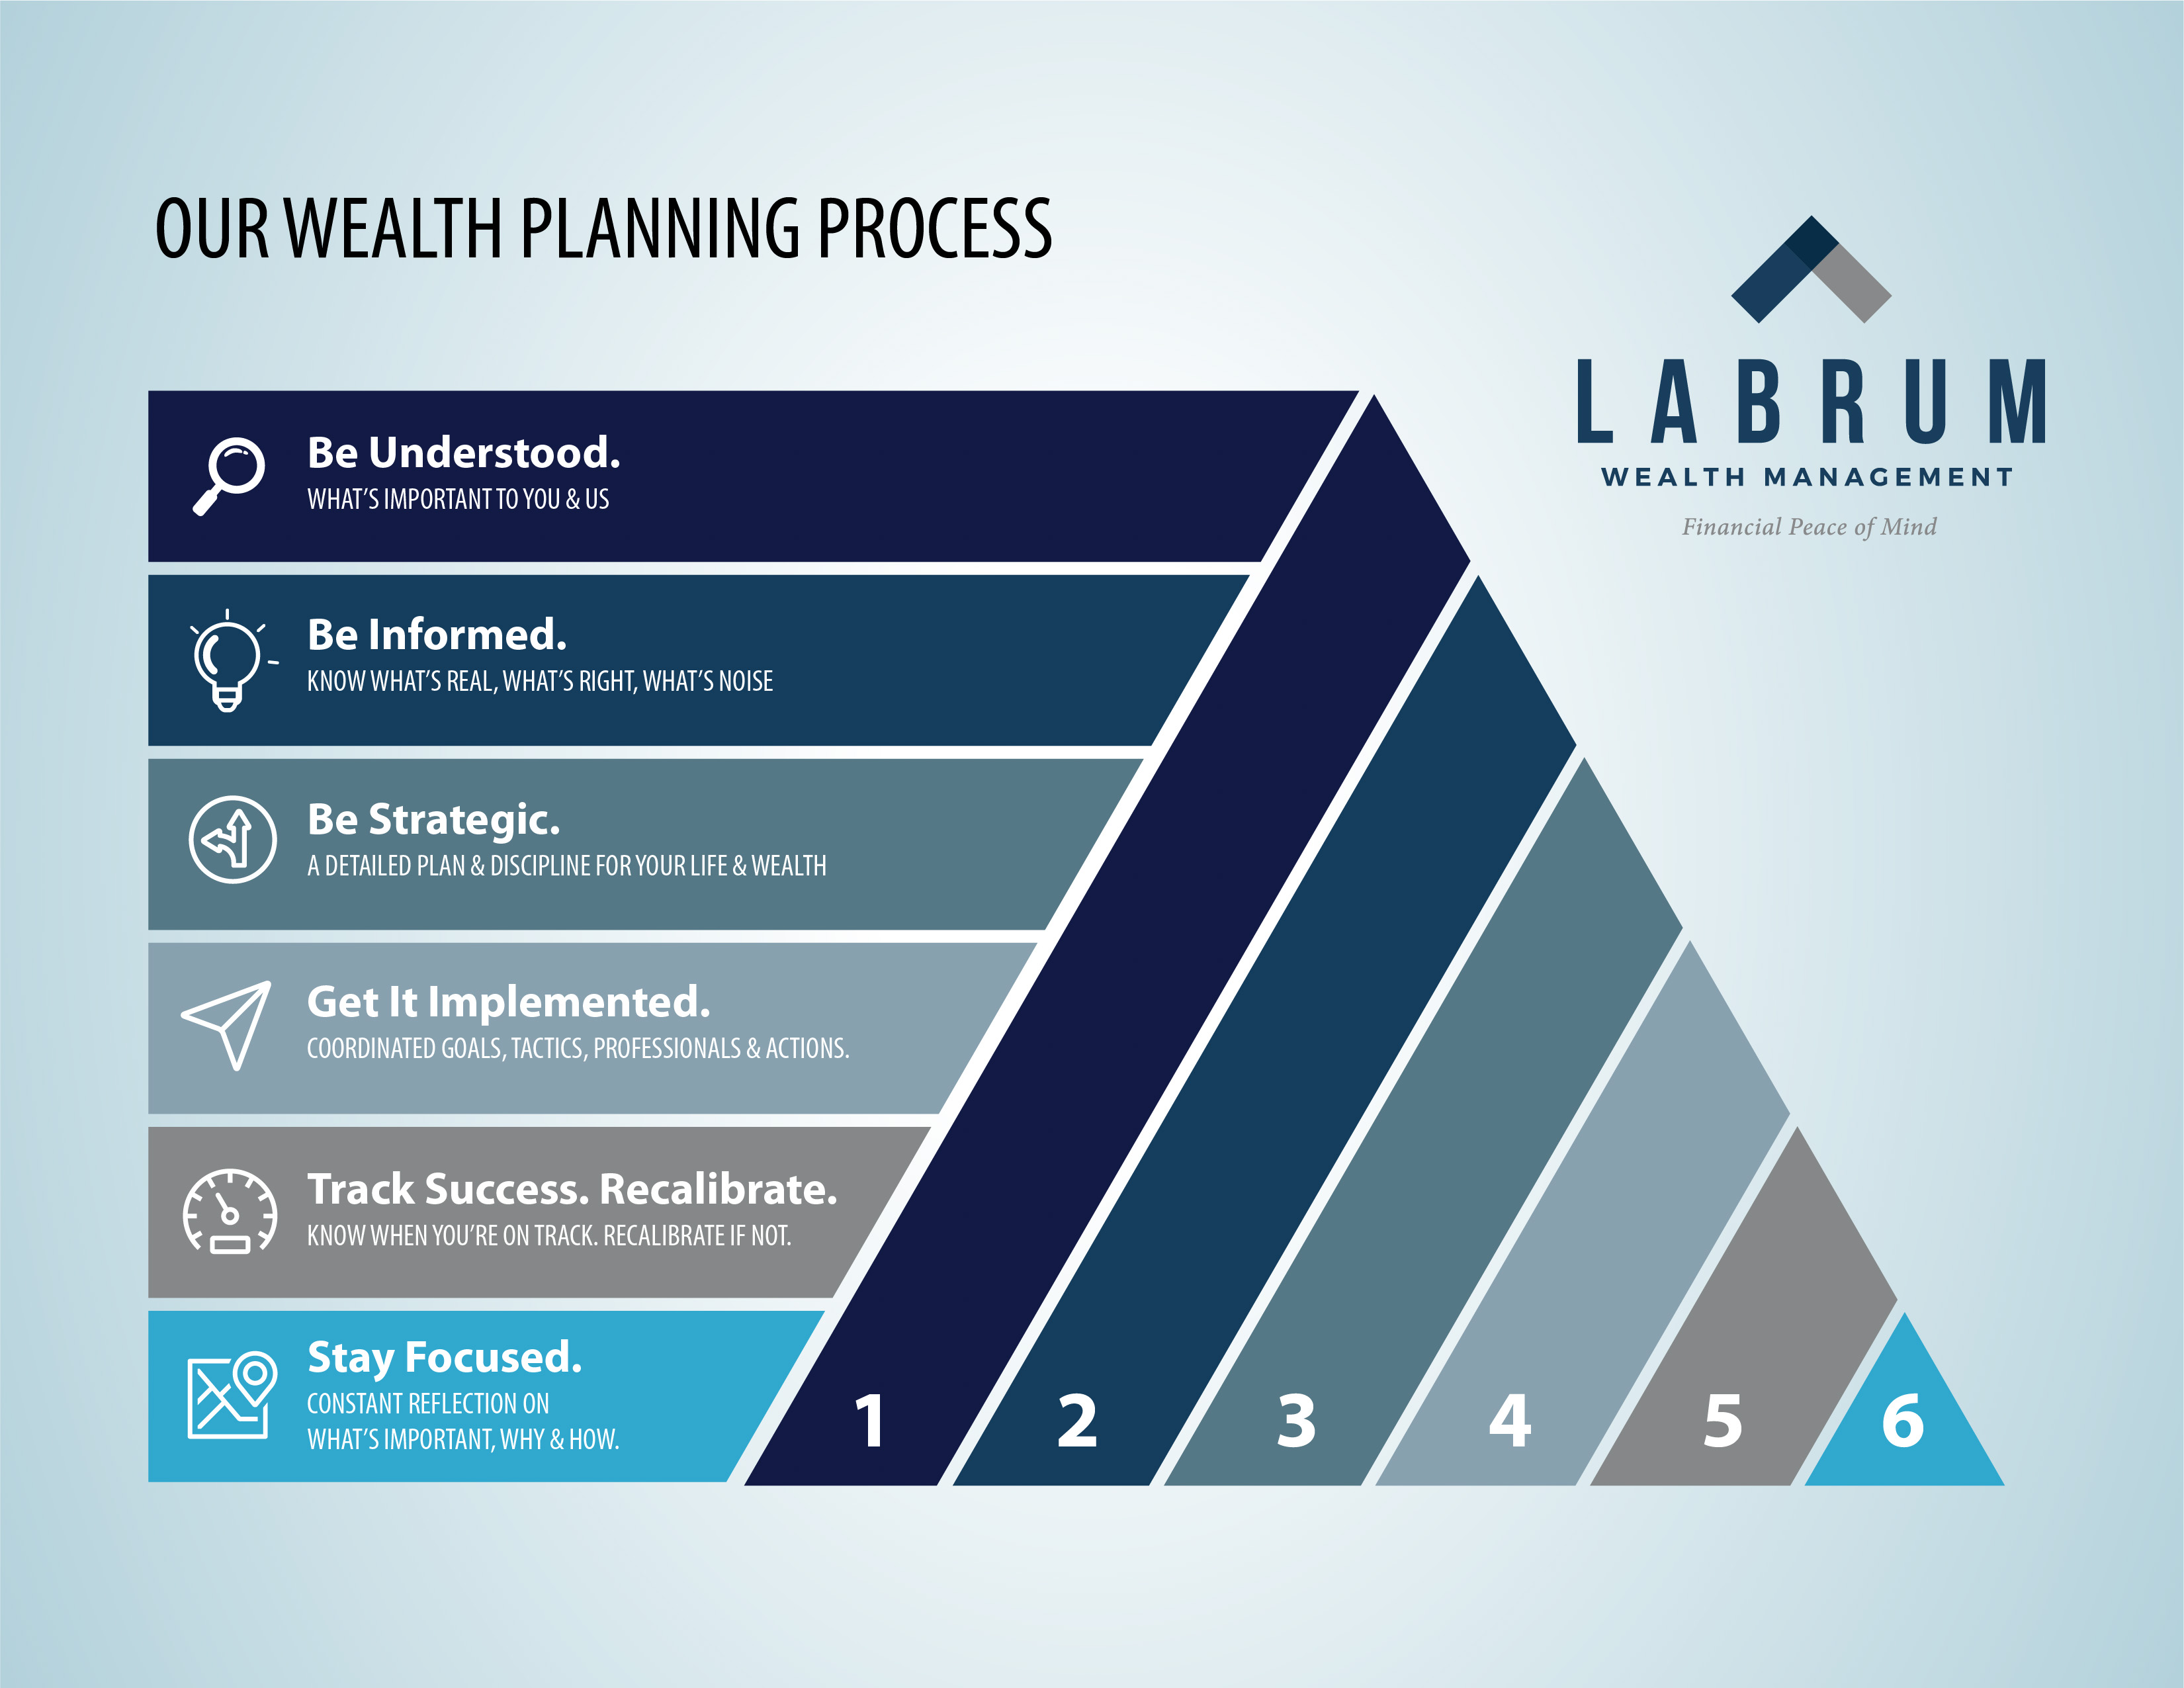 labrum wealth planning process